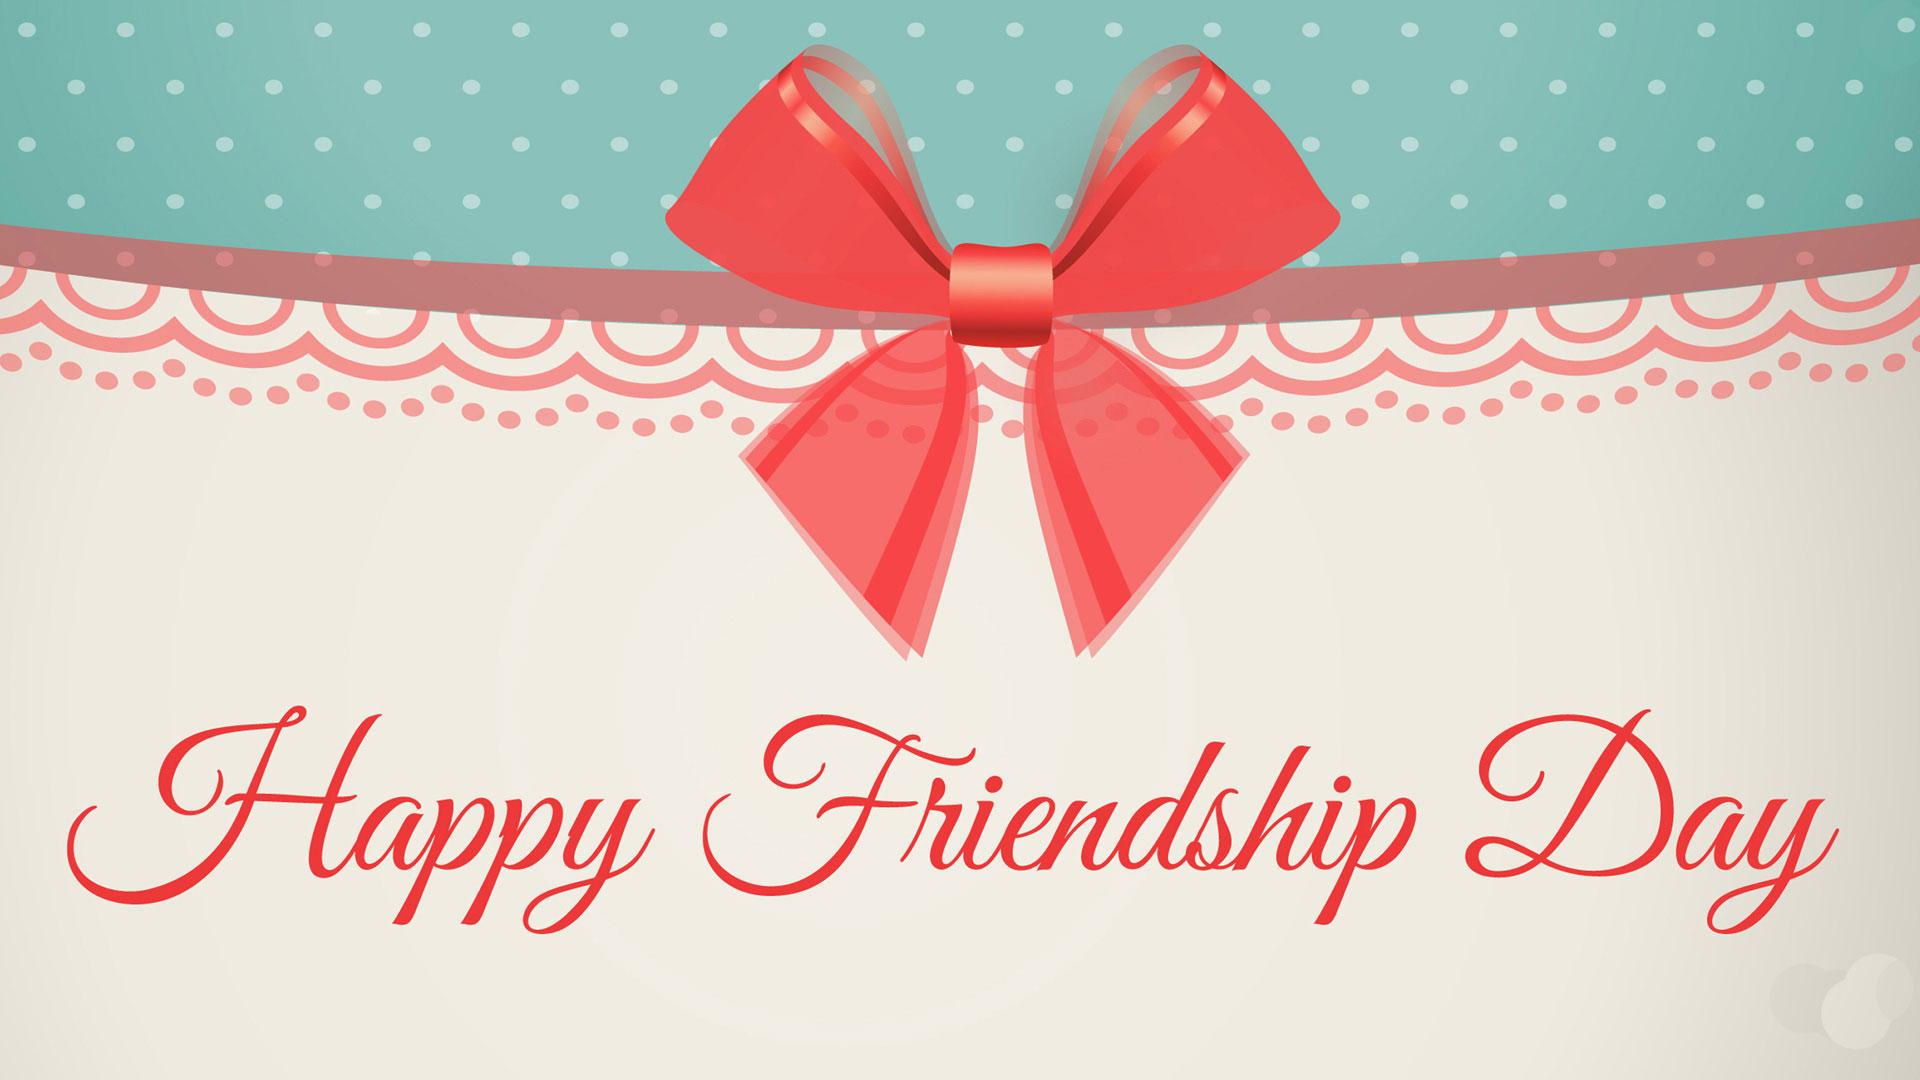 Friendship Day Gift HD Wallpaper